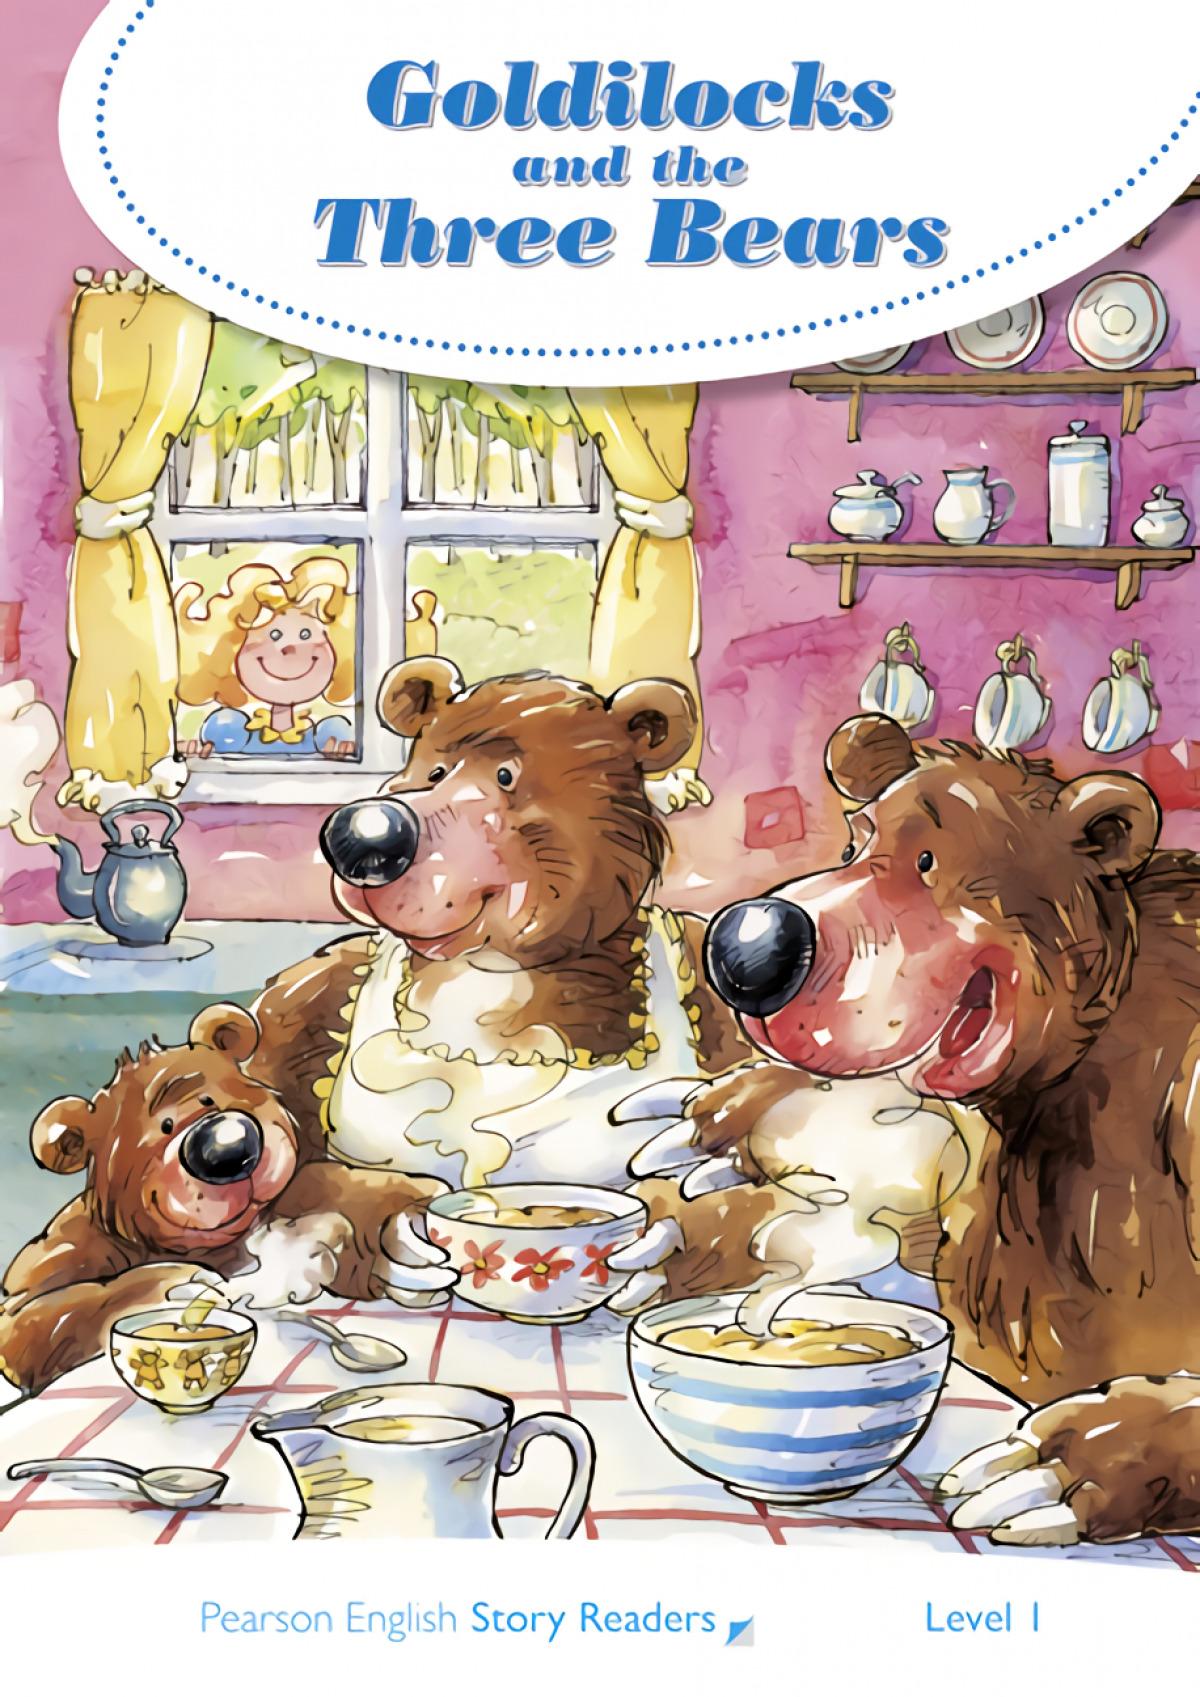 Level 1: Goldilocks and the Three Bears